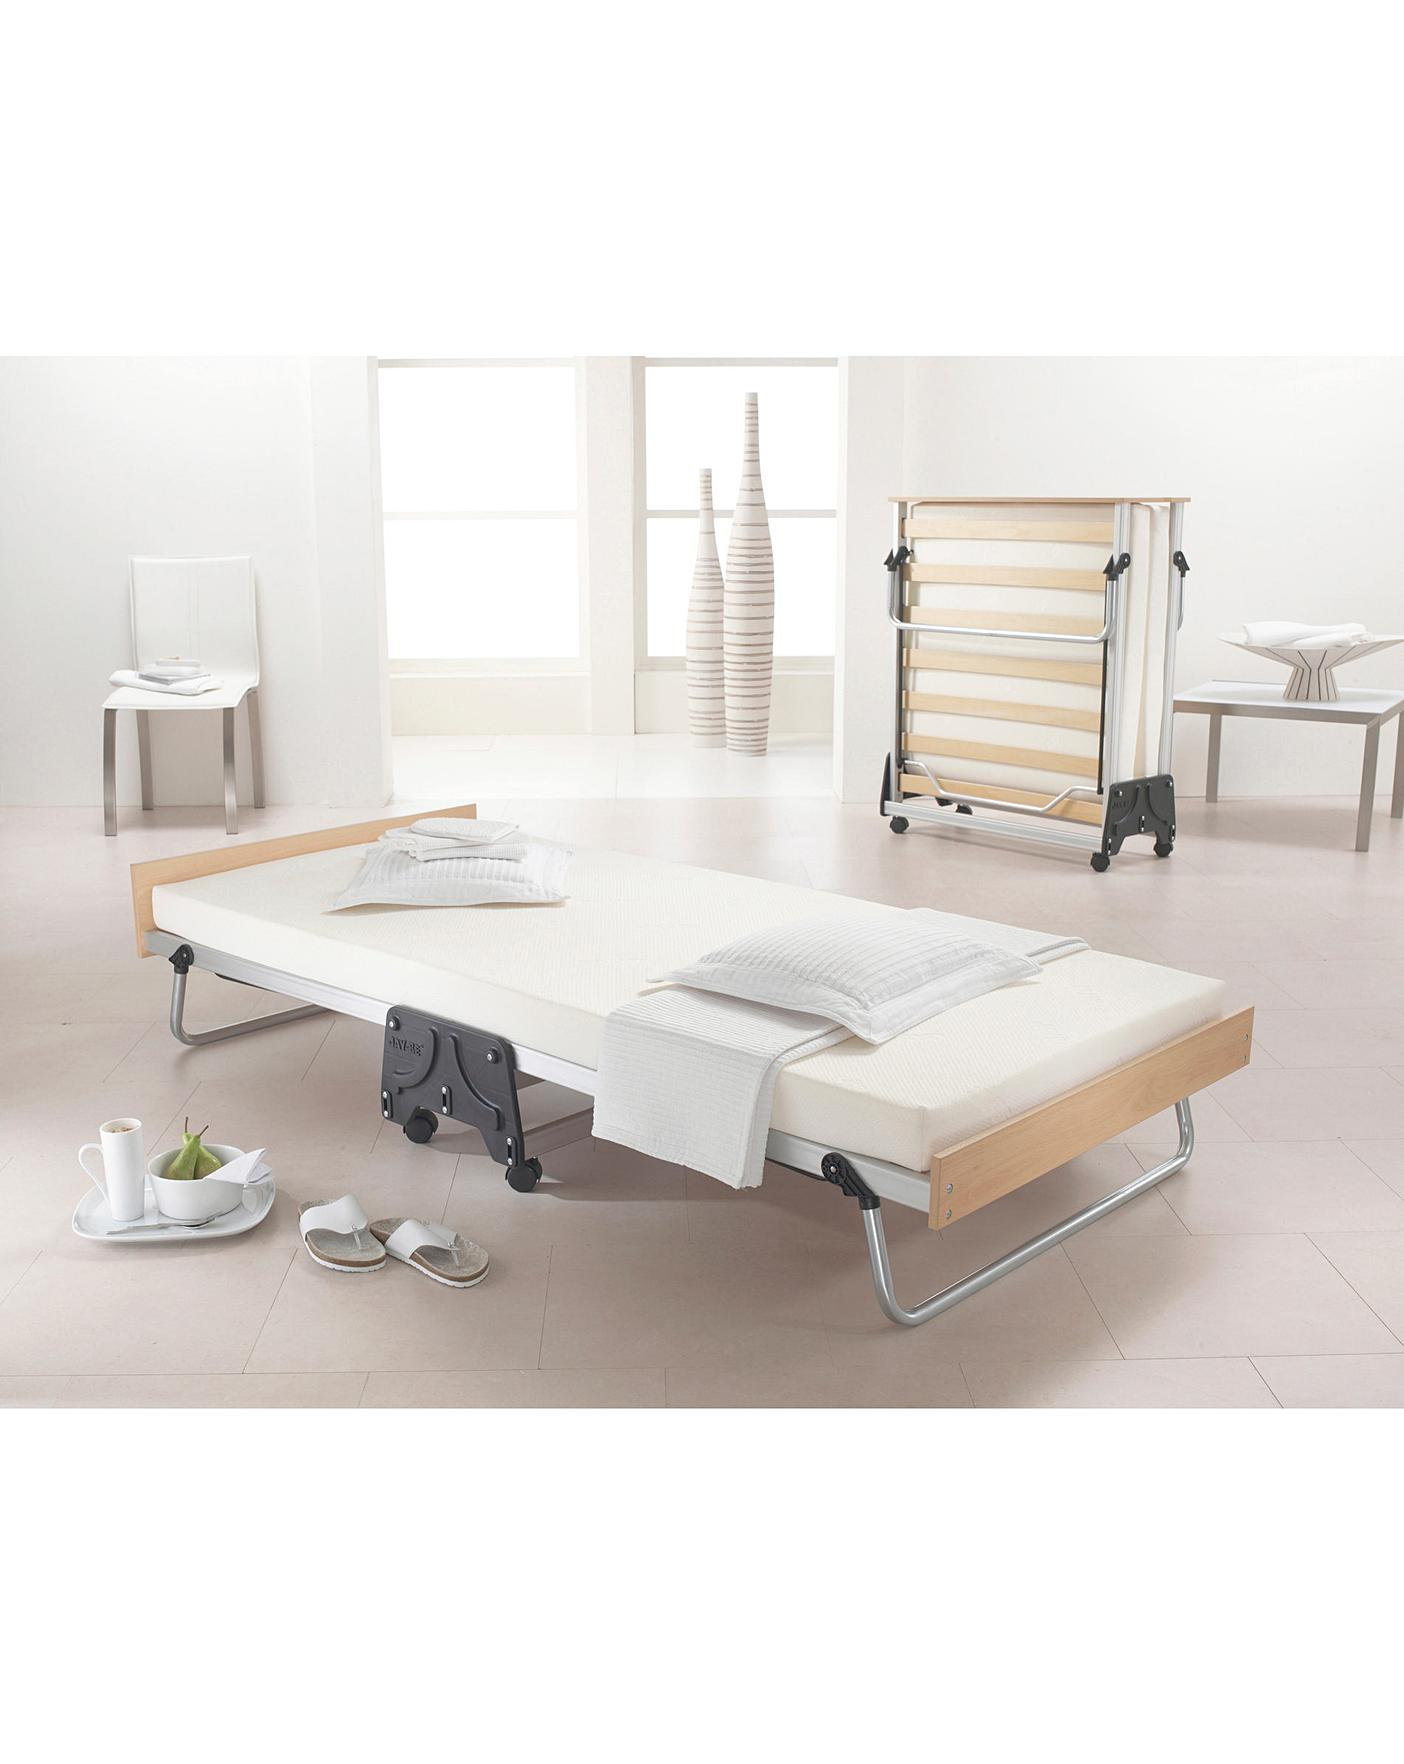 J Bed Single Fold Bed Airflow Mattress J D Williams